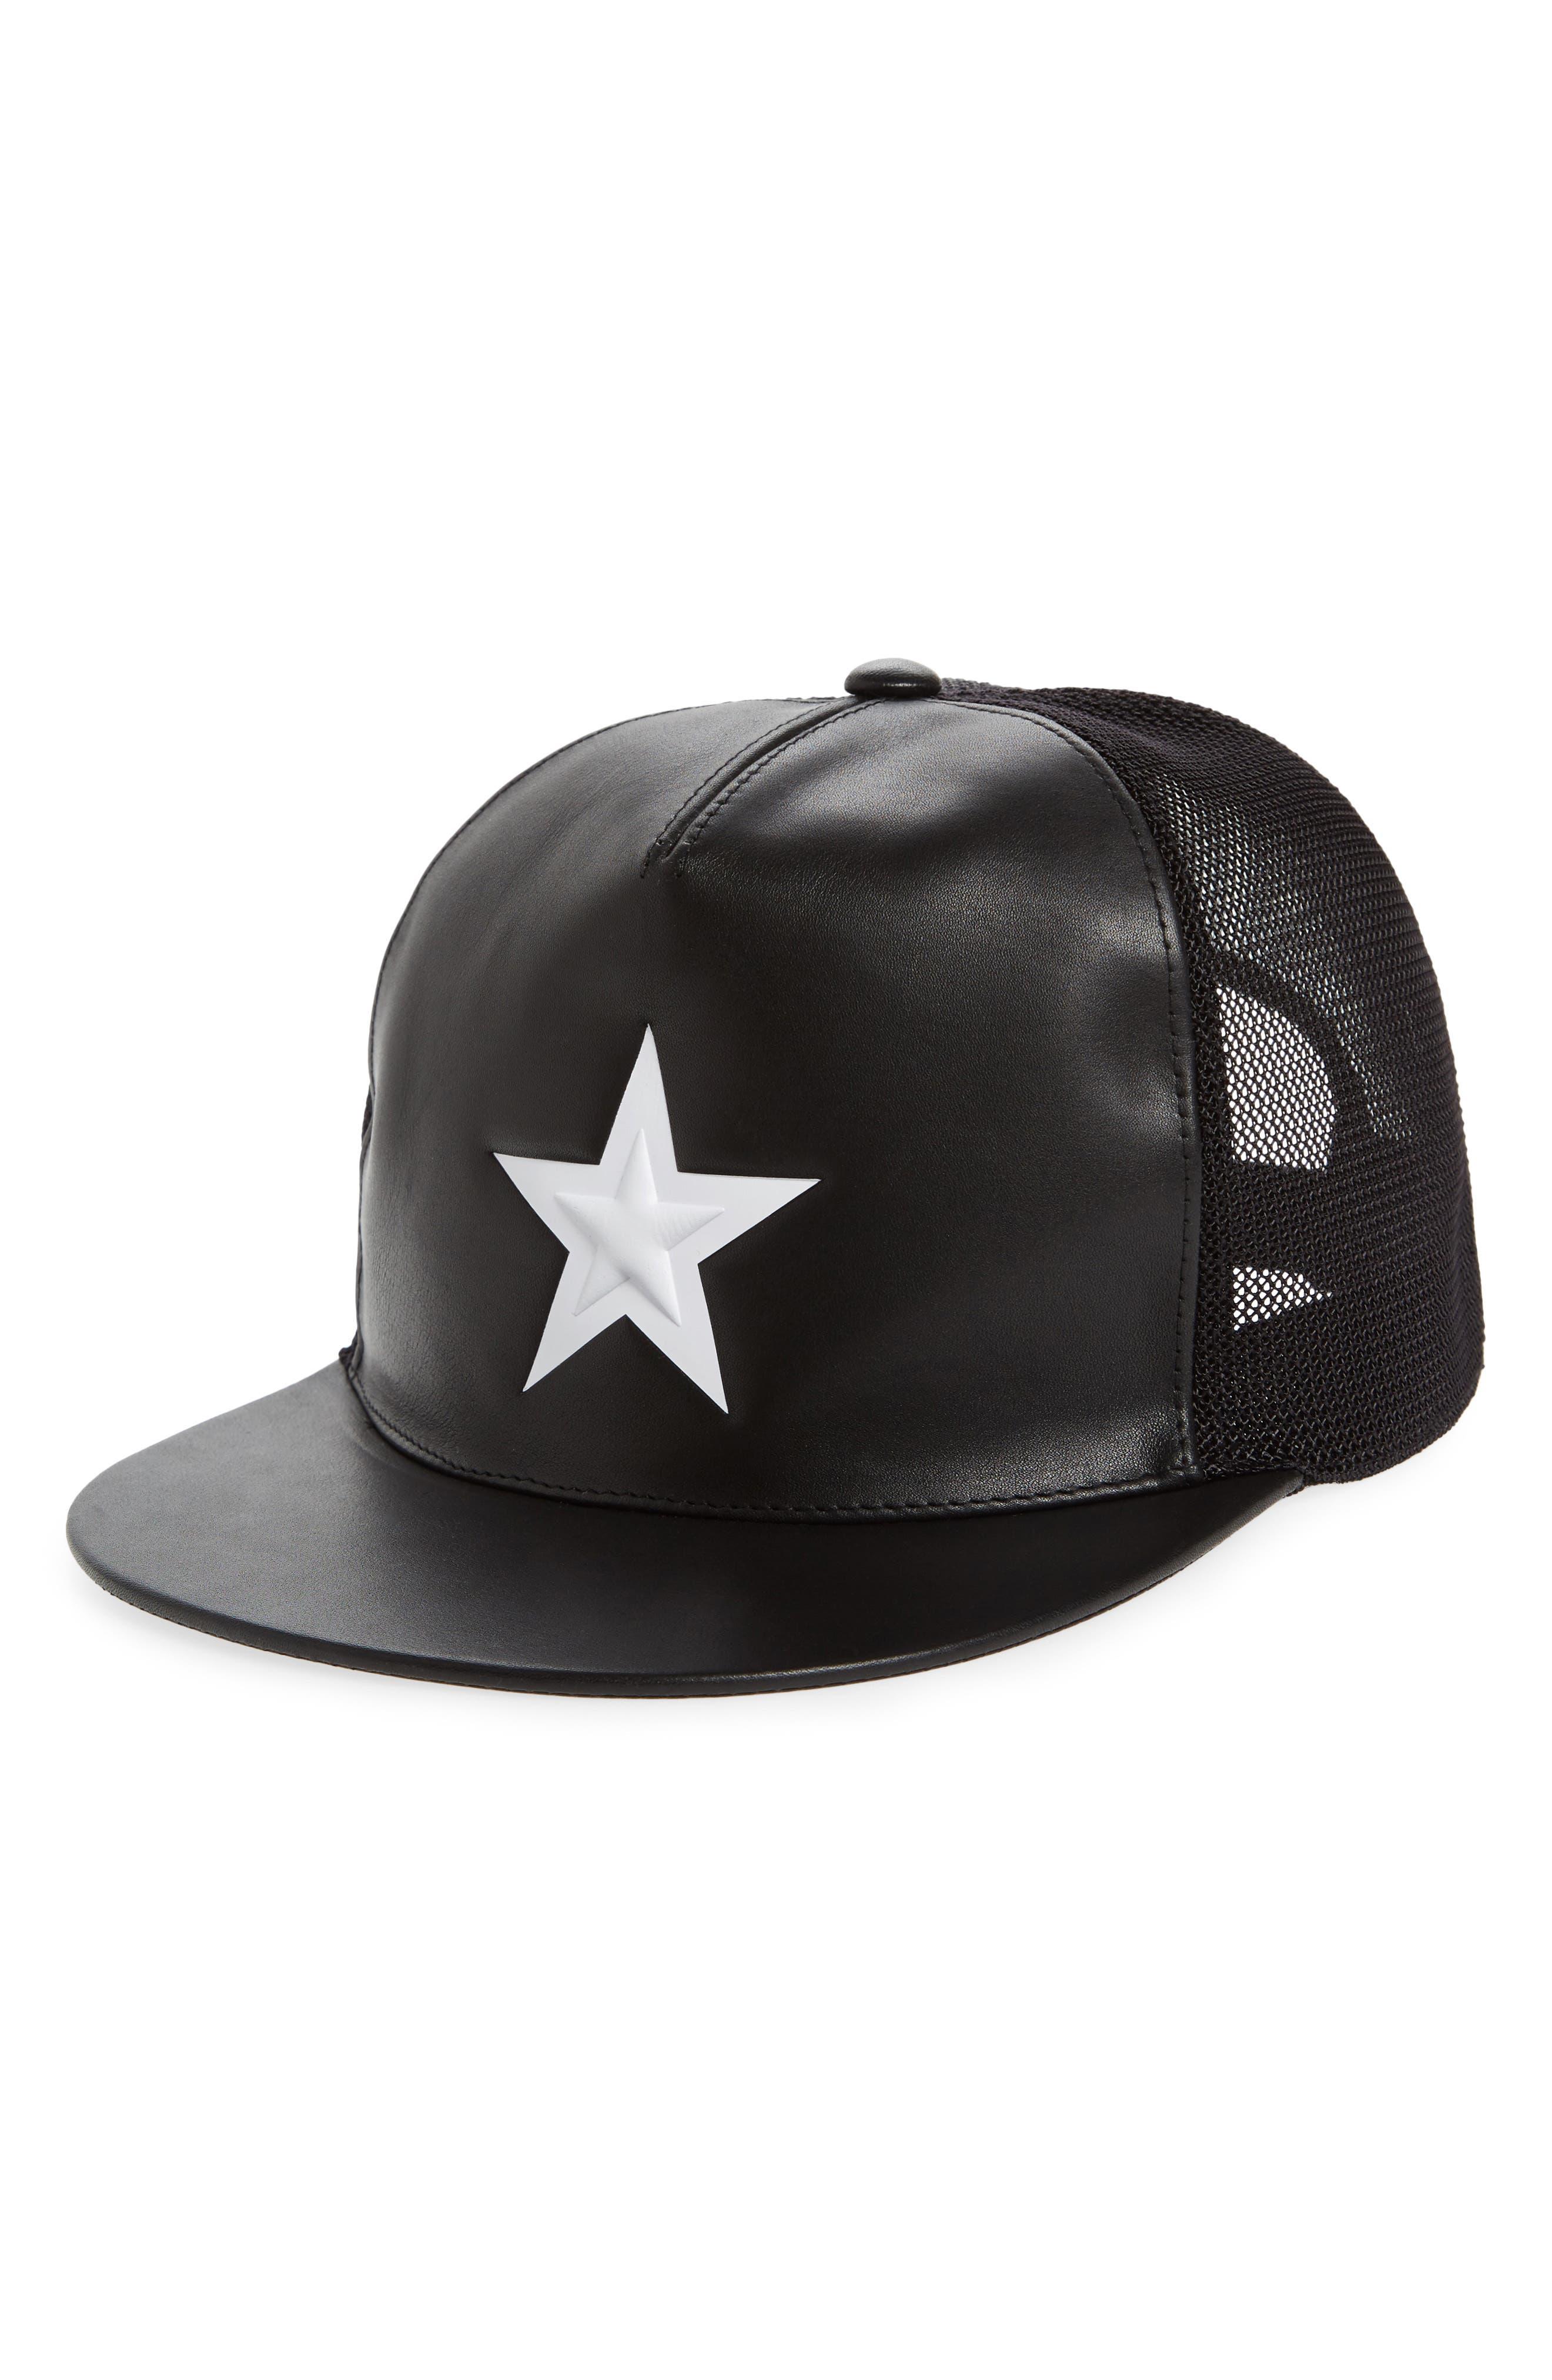 Star Leather Trucker Cap,                             Main thumbnail 1, color,                             Black/White